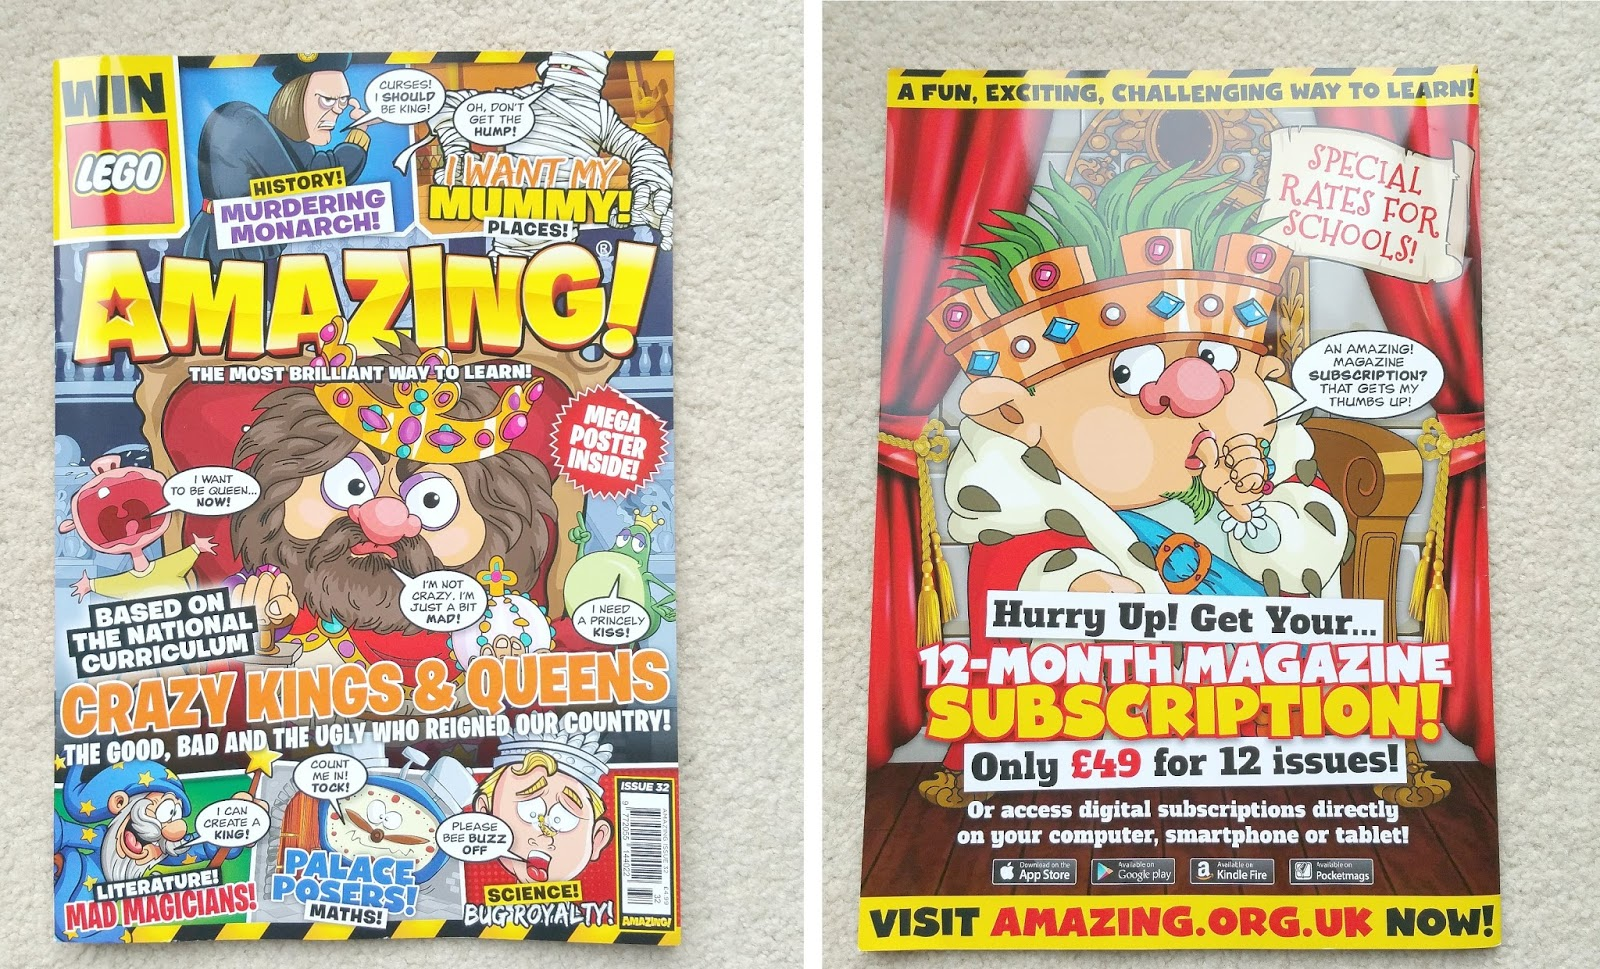 Children magazine, Amazing! Magazine, Educational magazine for kids